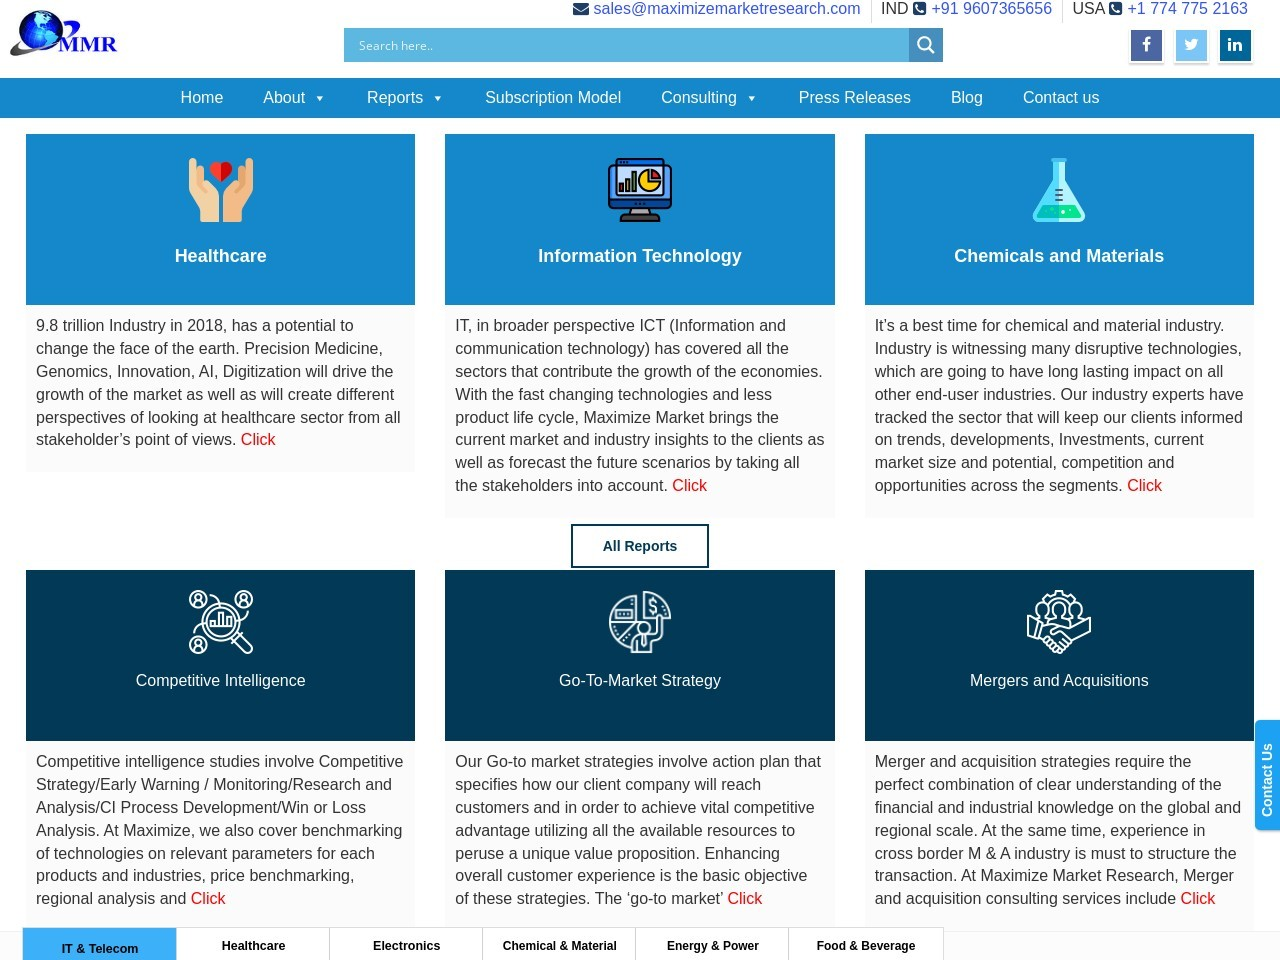 Global Intelligent Platform Management Interface (IPMI) Market- Industry Analysis and Forecast (2020